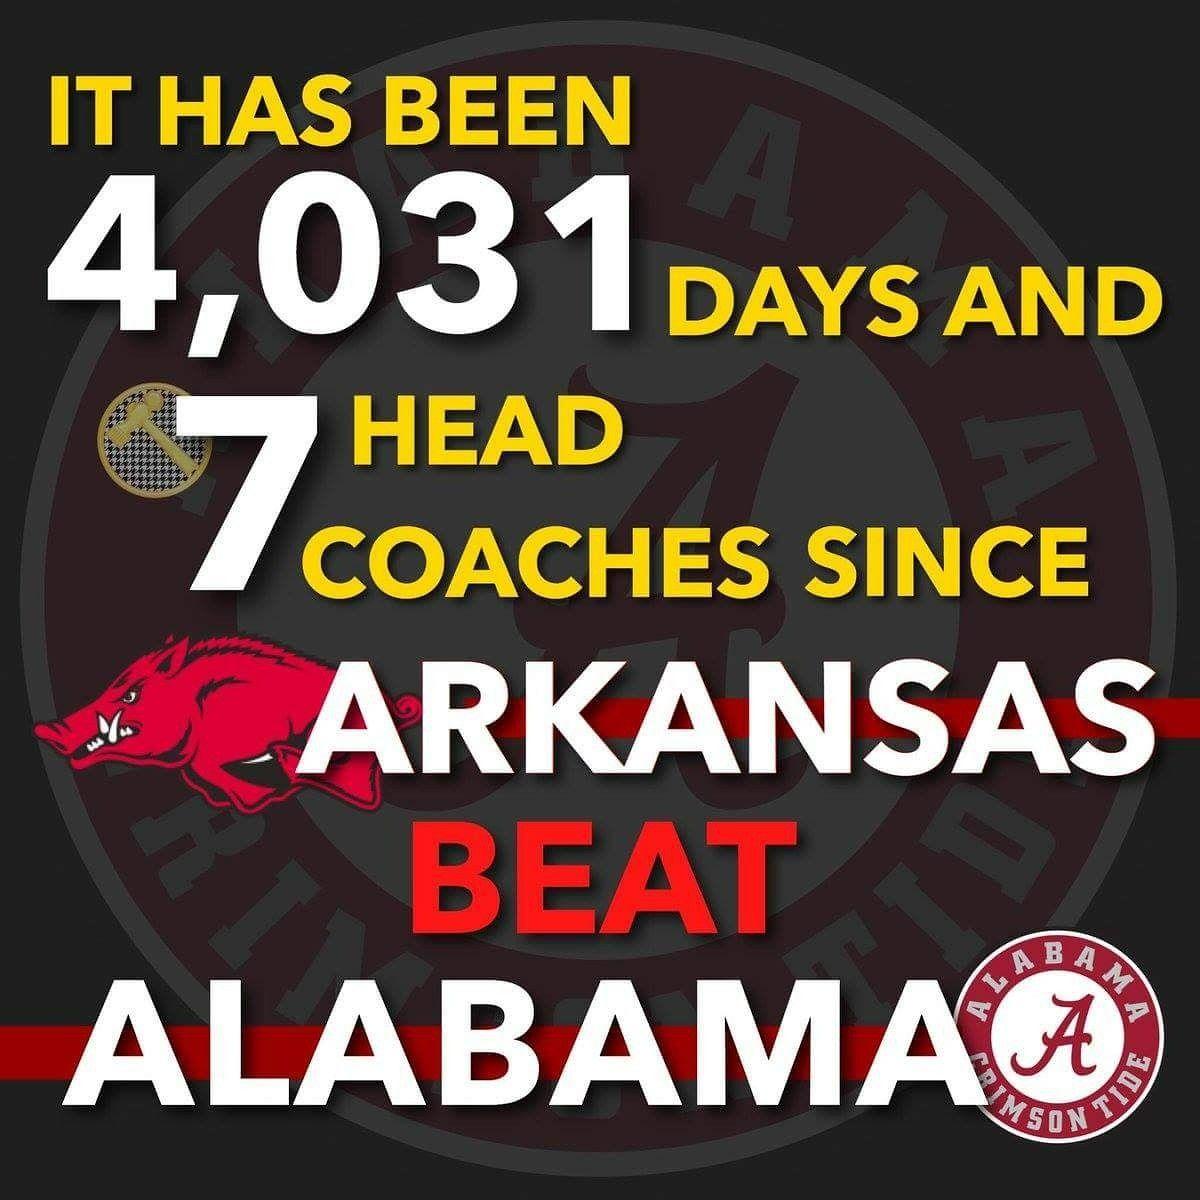 Alabama football vs arkansas alabama football roll tide